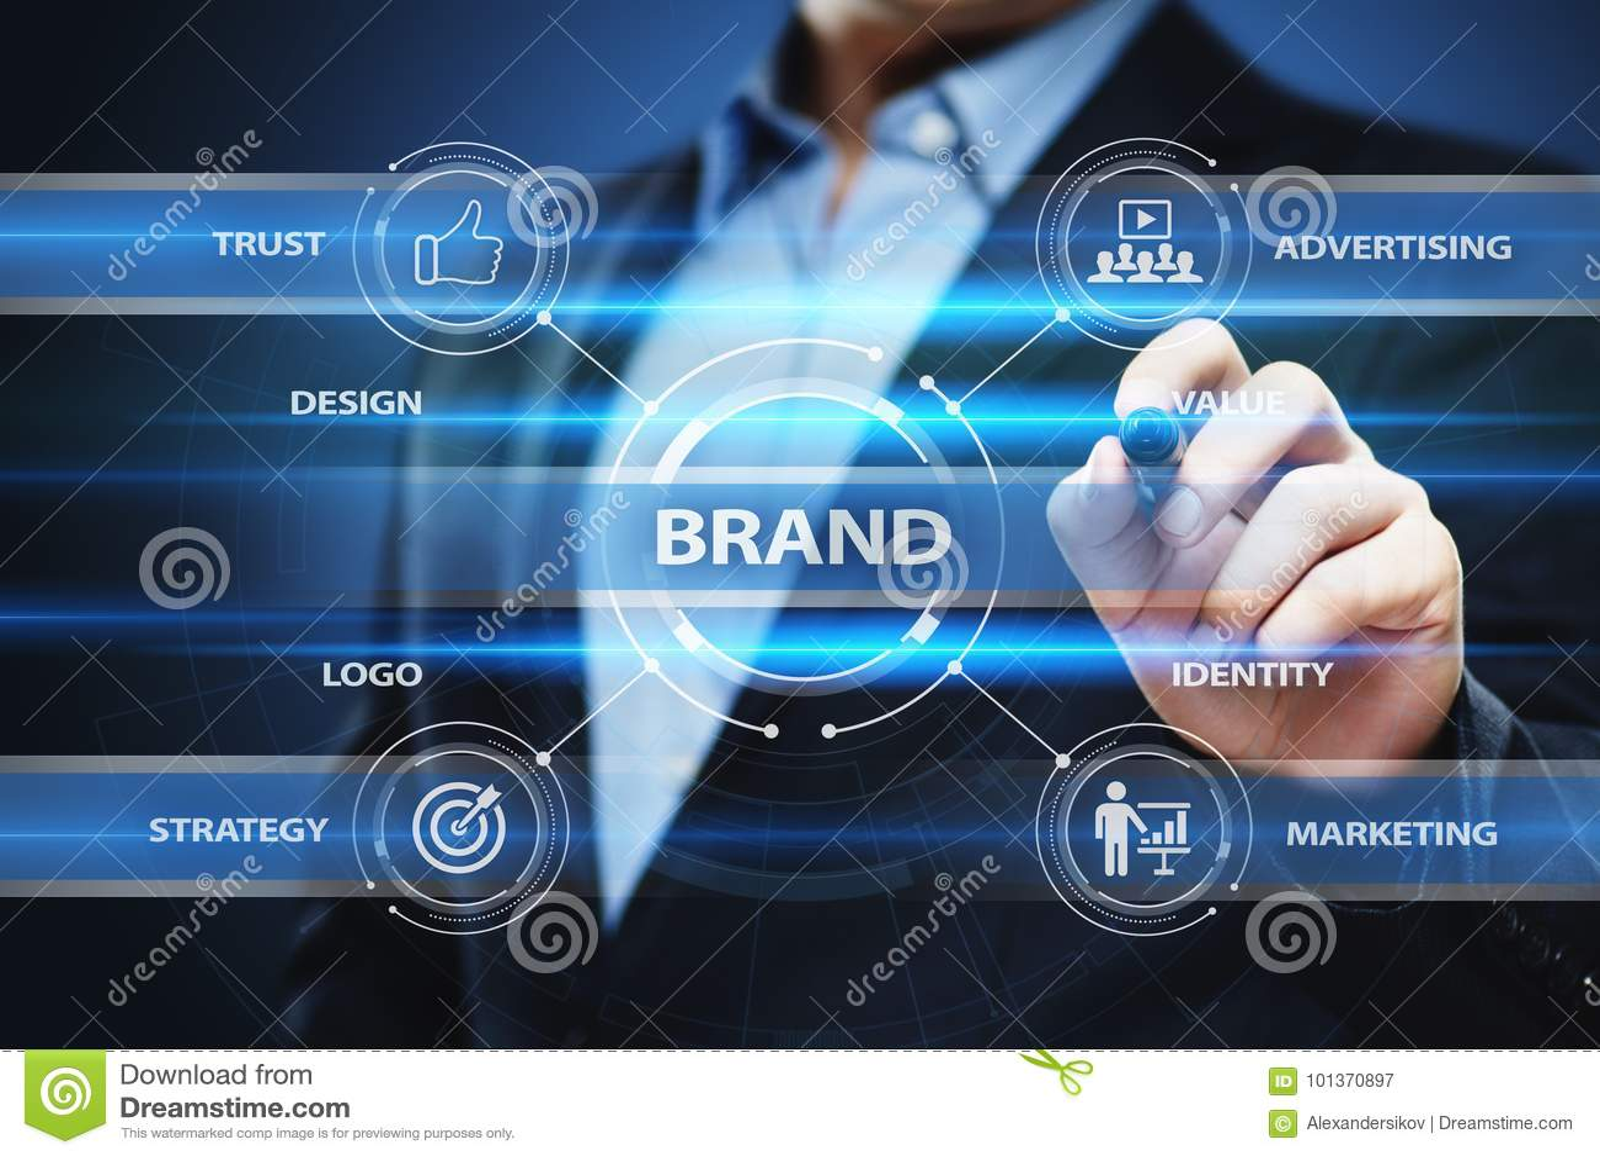 Brand Advertising Marketing Strategy Identity Business